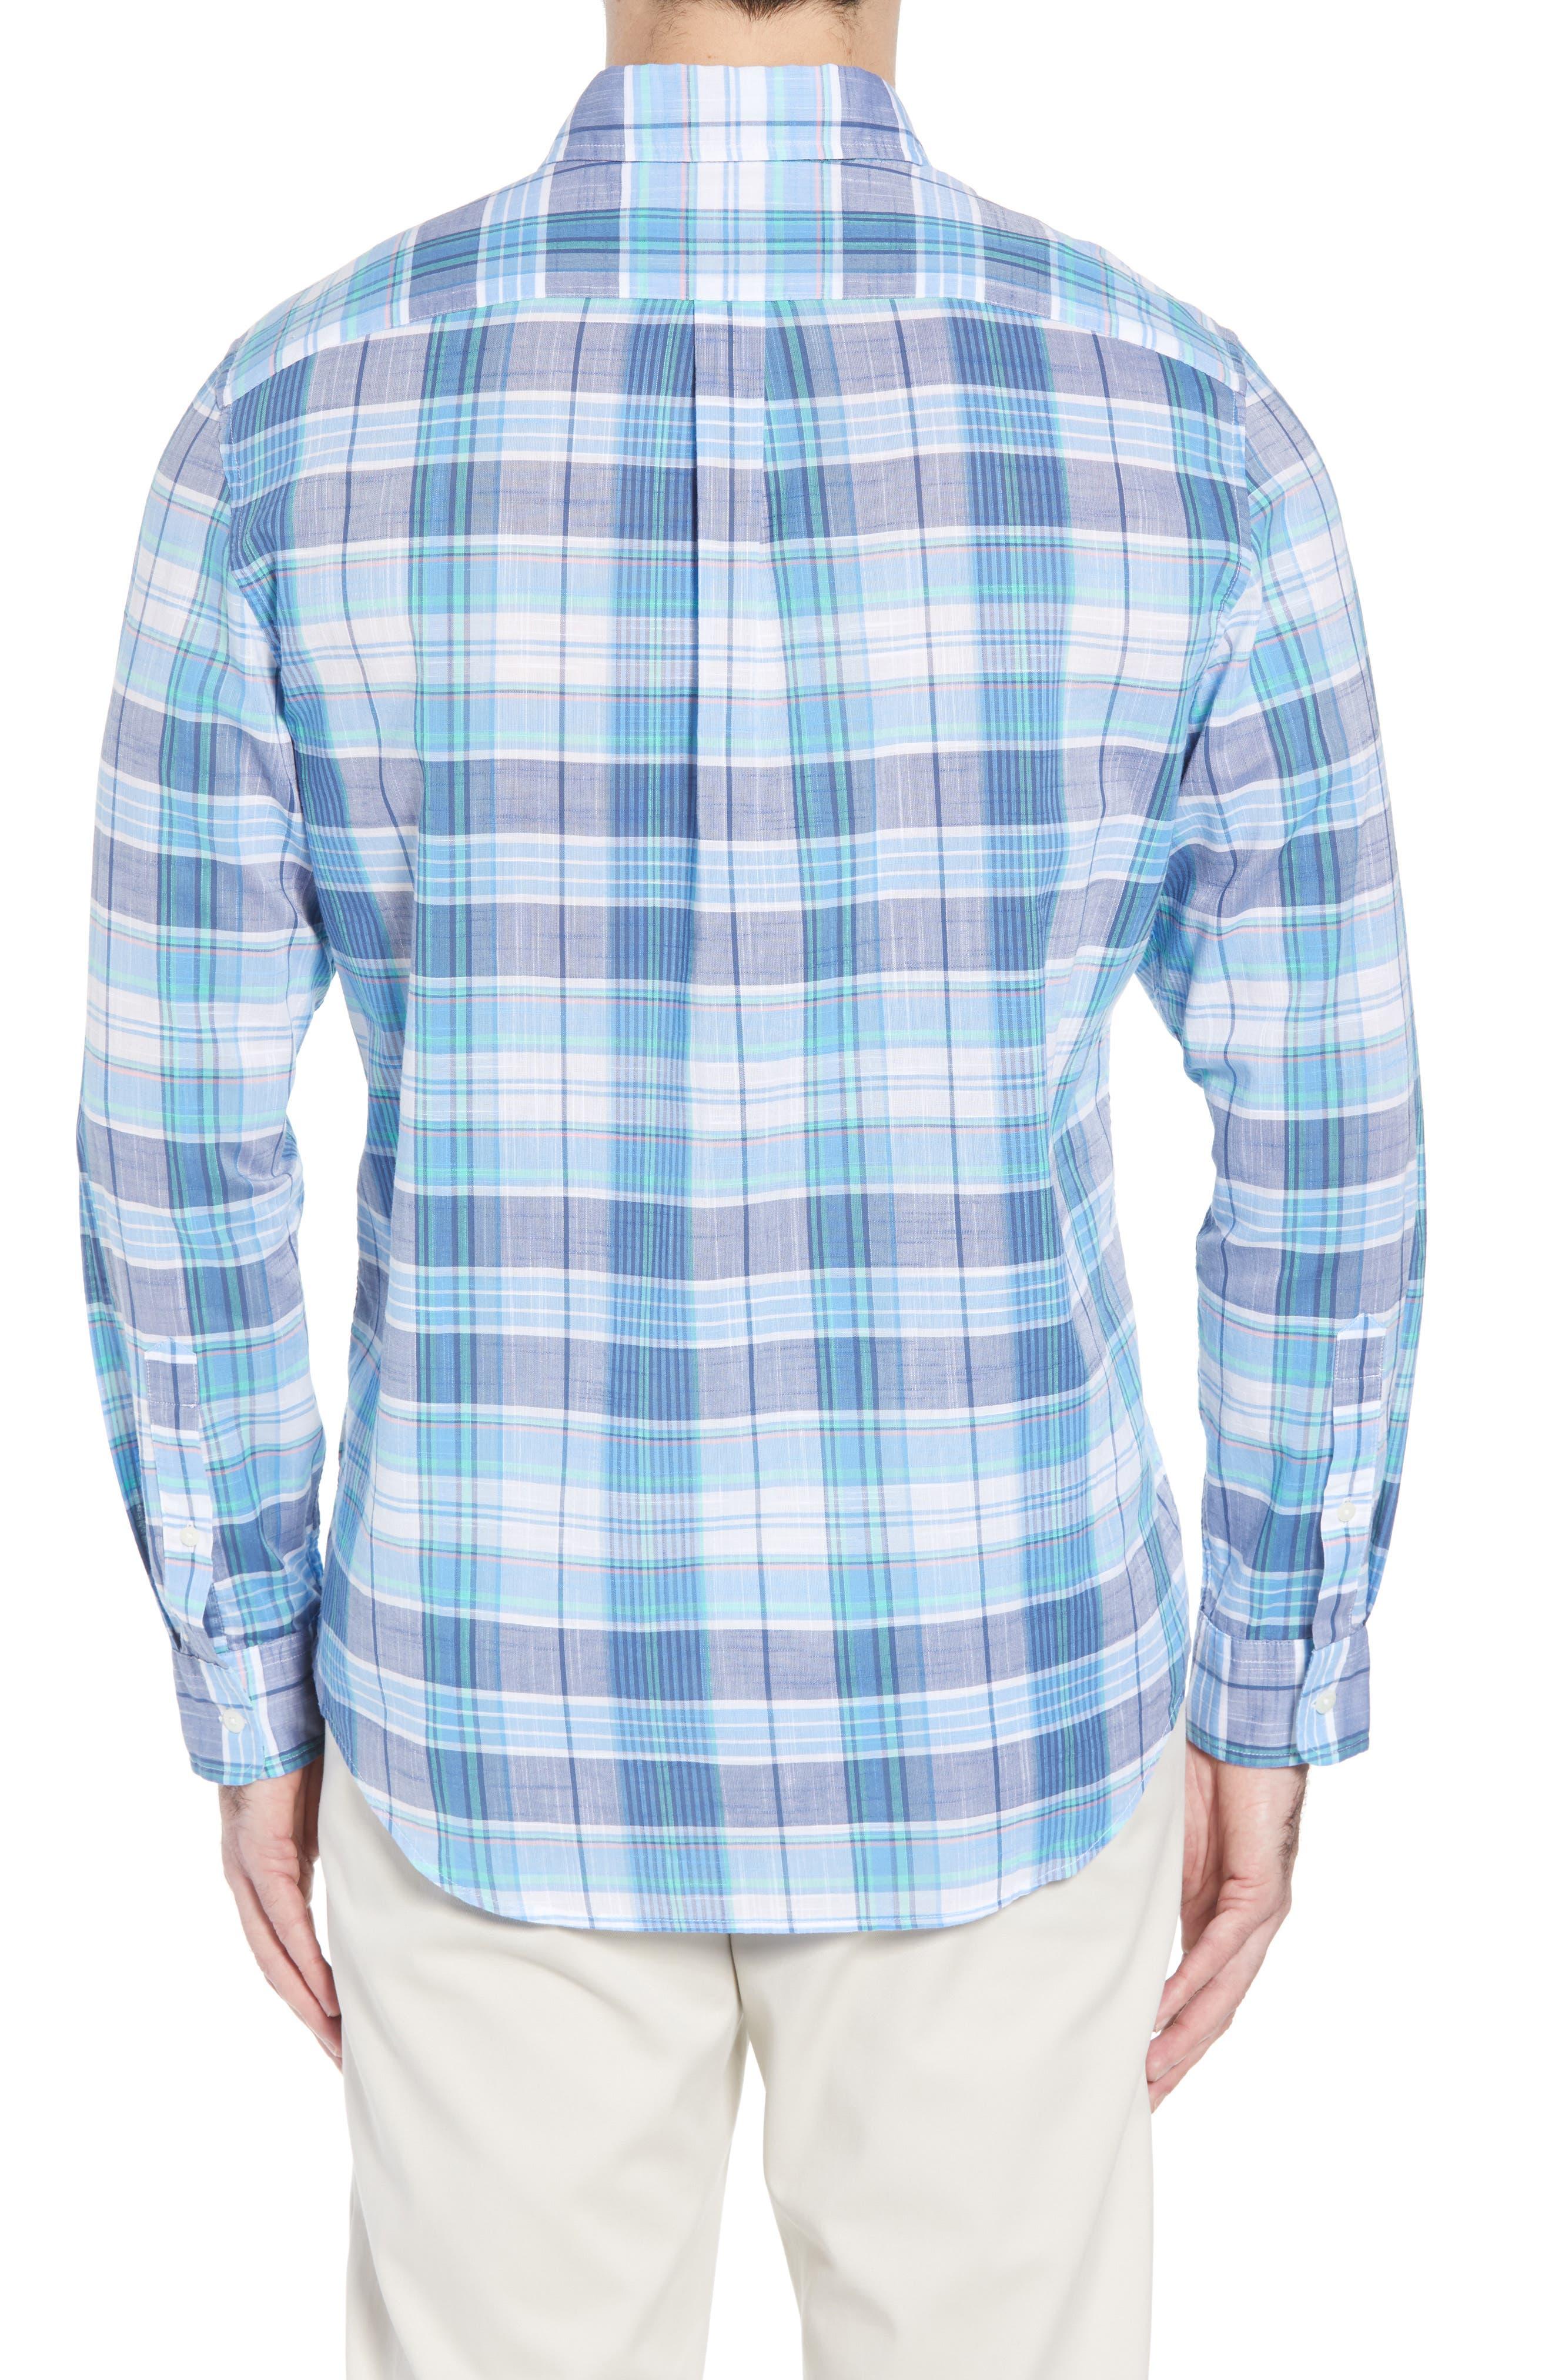 Smith Point Tucker Classic Fit Plaid Sport Shirt,                             Alternate thumbnail 2, color,                             Moonshine